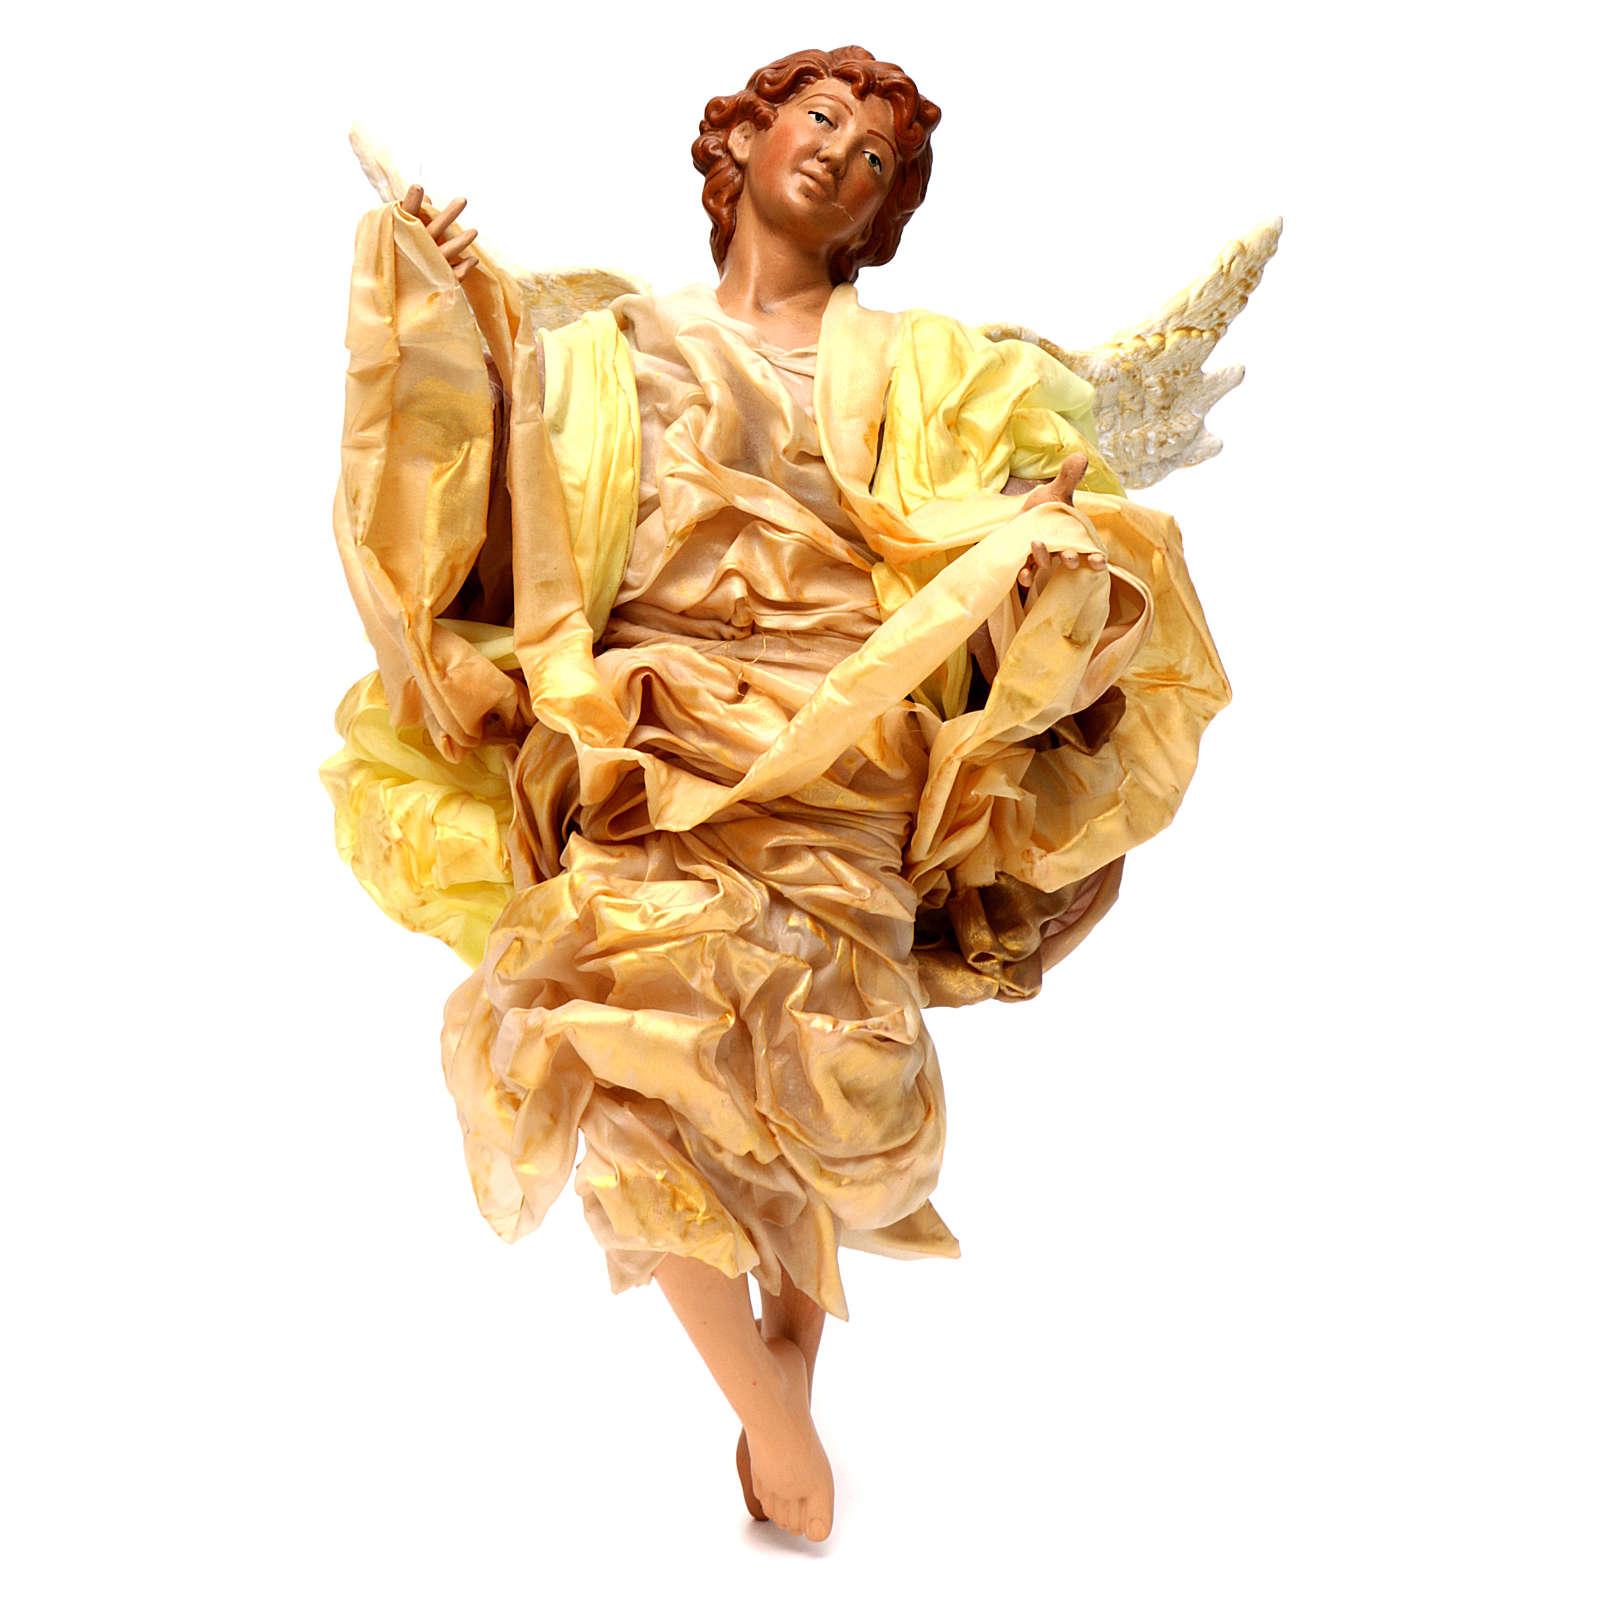 Ángel rubio 45 cm vestido oto belén Nápoles 4